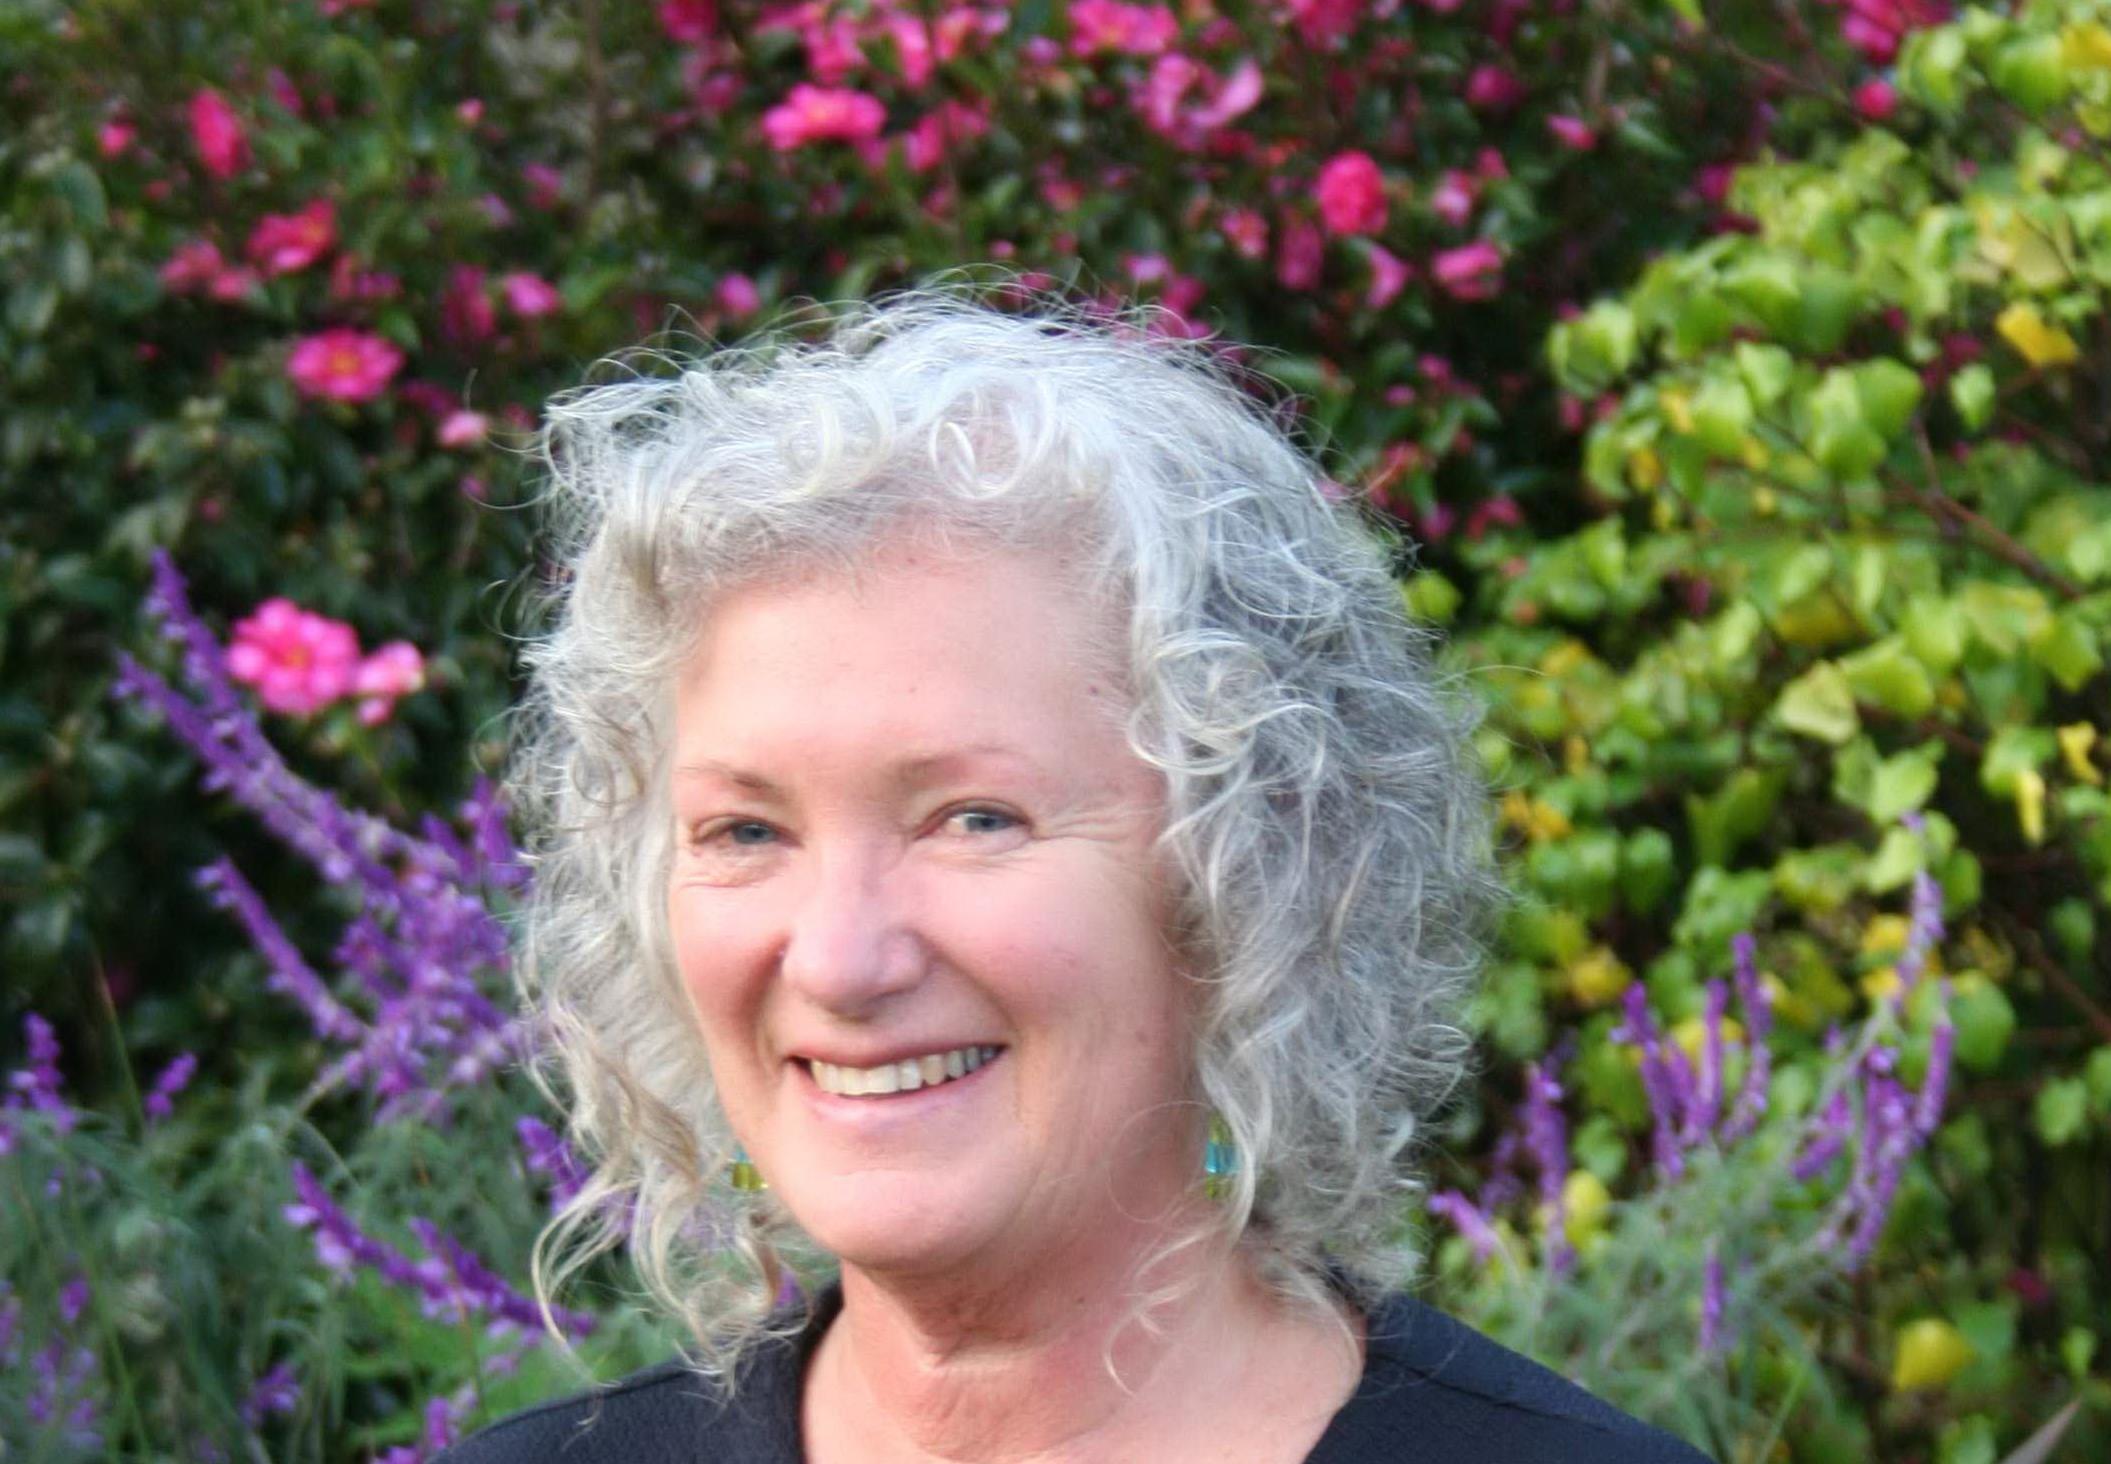 Wendy Henwood Iwi: Te Rarawa, Hapu: Ngai Tupoto Research Officer - Whariki  tirairaka@vodafone.co.nz